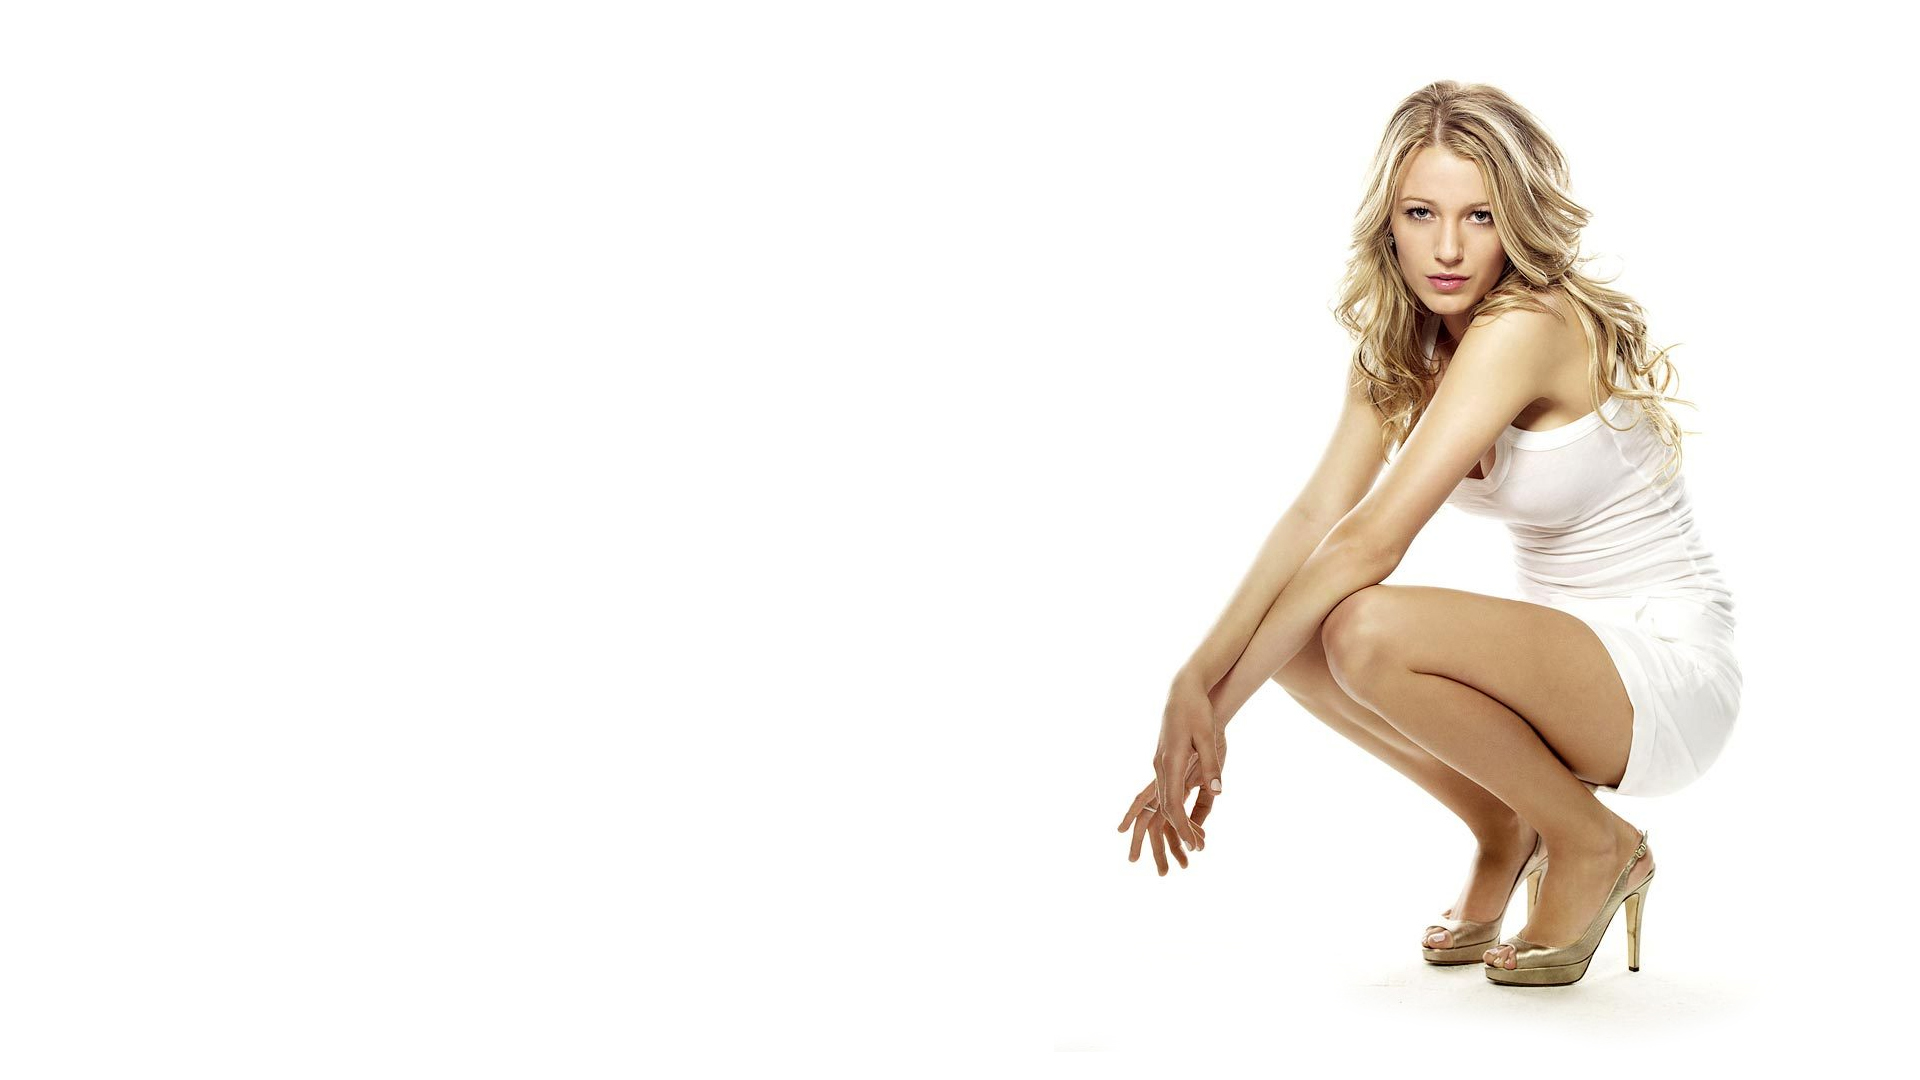 Blake Lively Heels on Blondes Women Blake Lively High Heels White Dress Hd Wallpaper   Girls